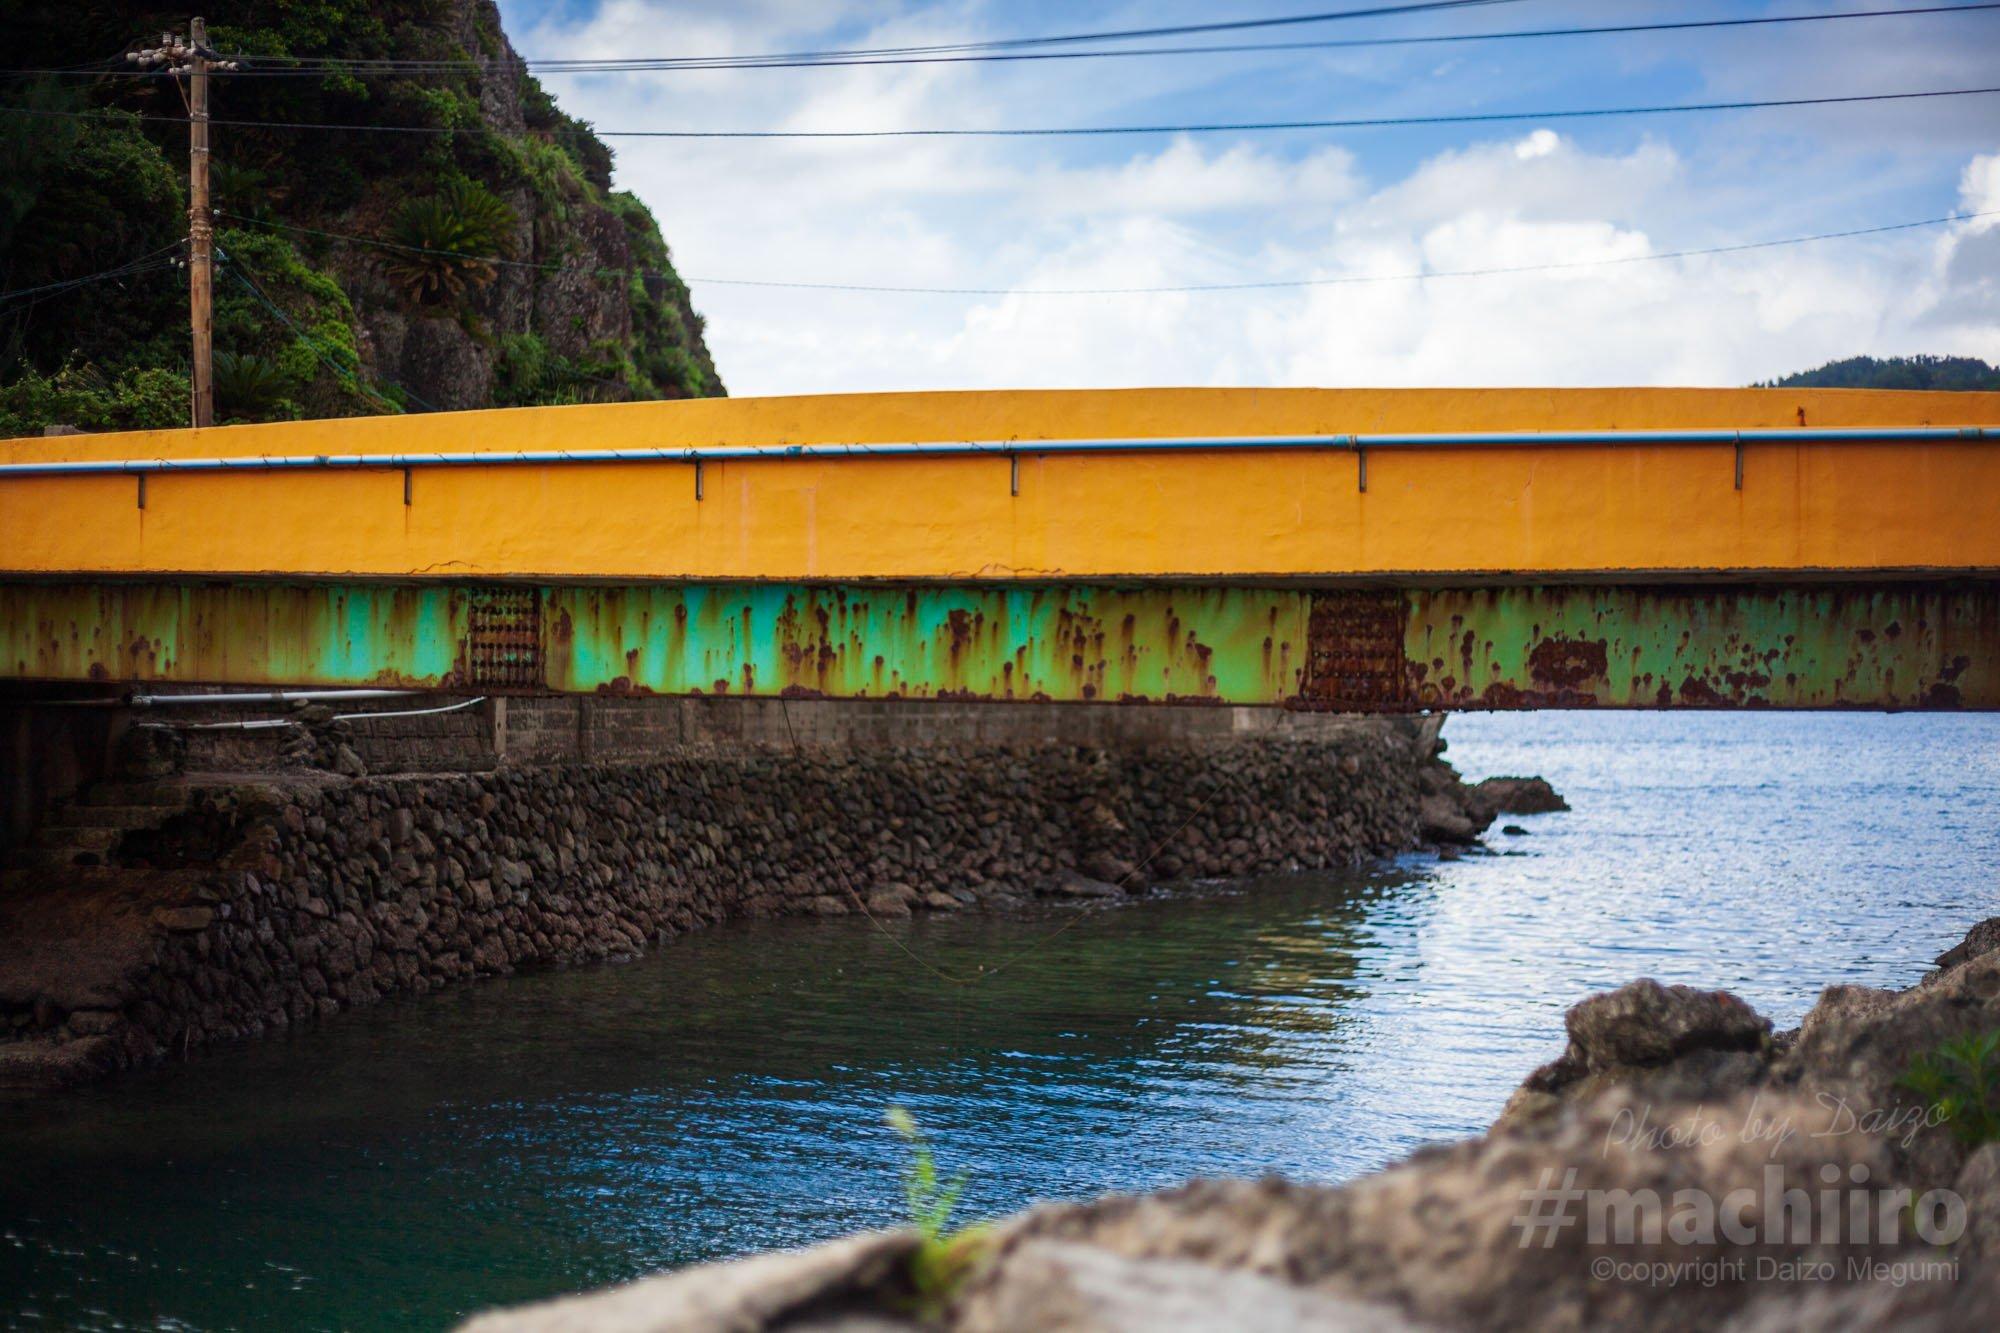 奄美探訪 旧山羊島ホテル Machiiro 記事写真 13